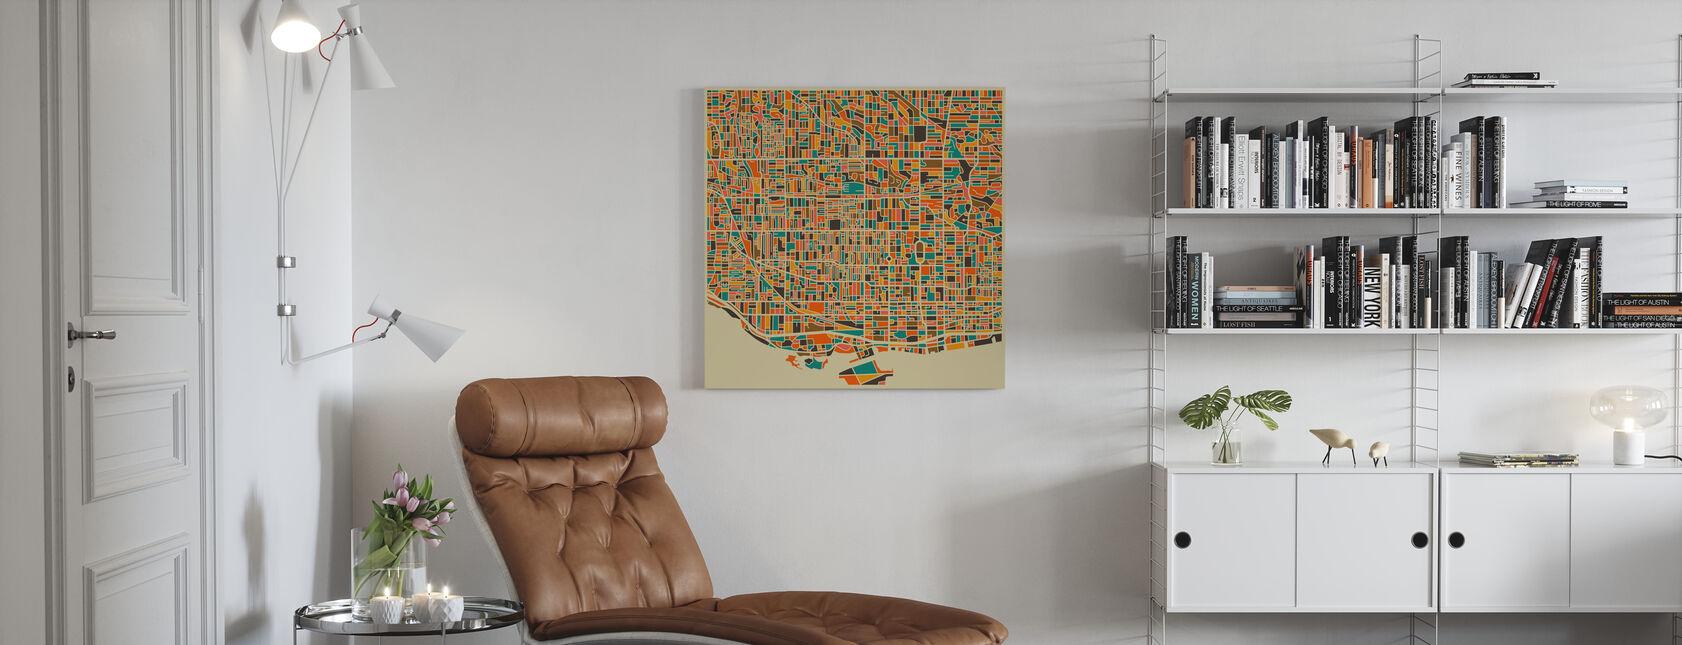 Karta över Multicolor - Toronto - Canvastavla - Vardagsrum